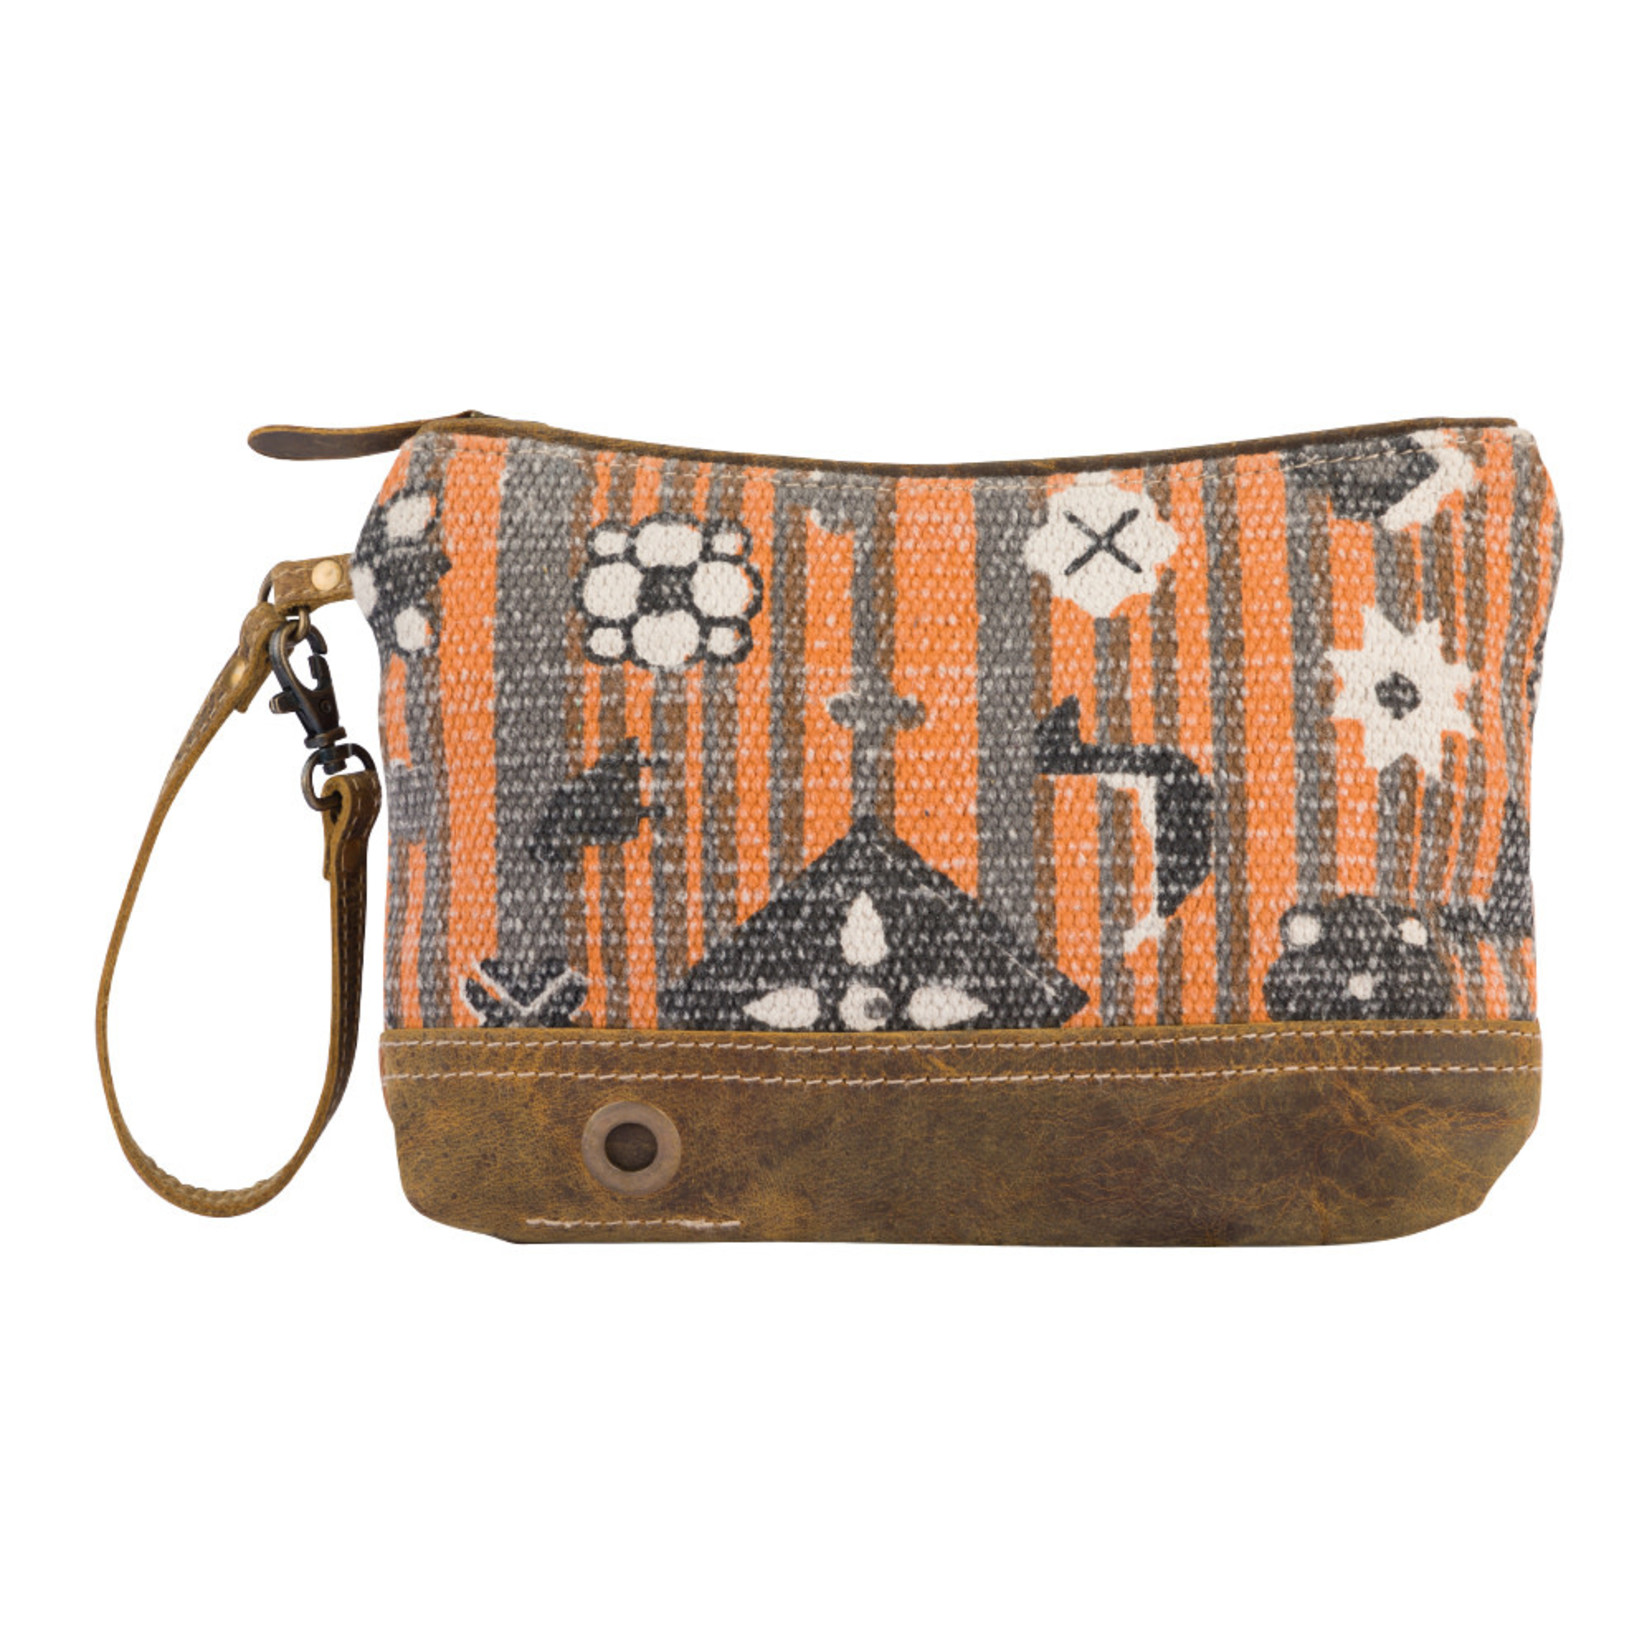 Myra Bags S-2200 Vivid Dreams Wristlet